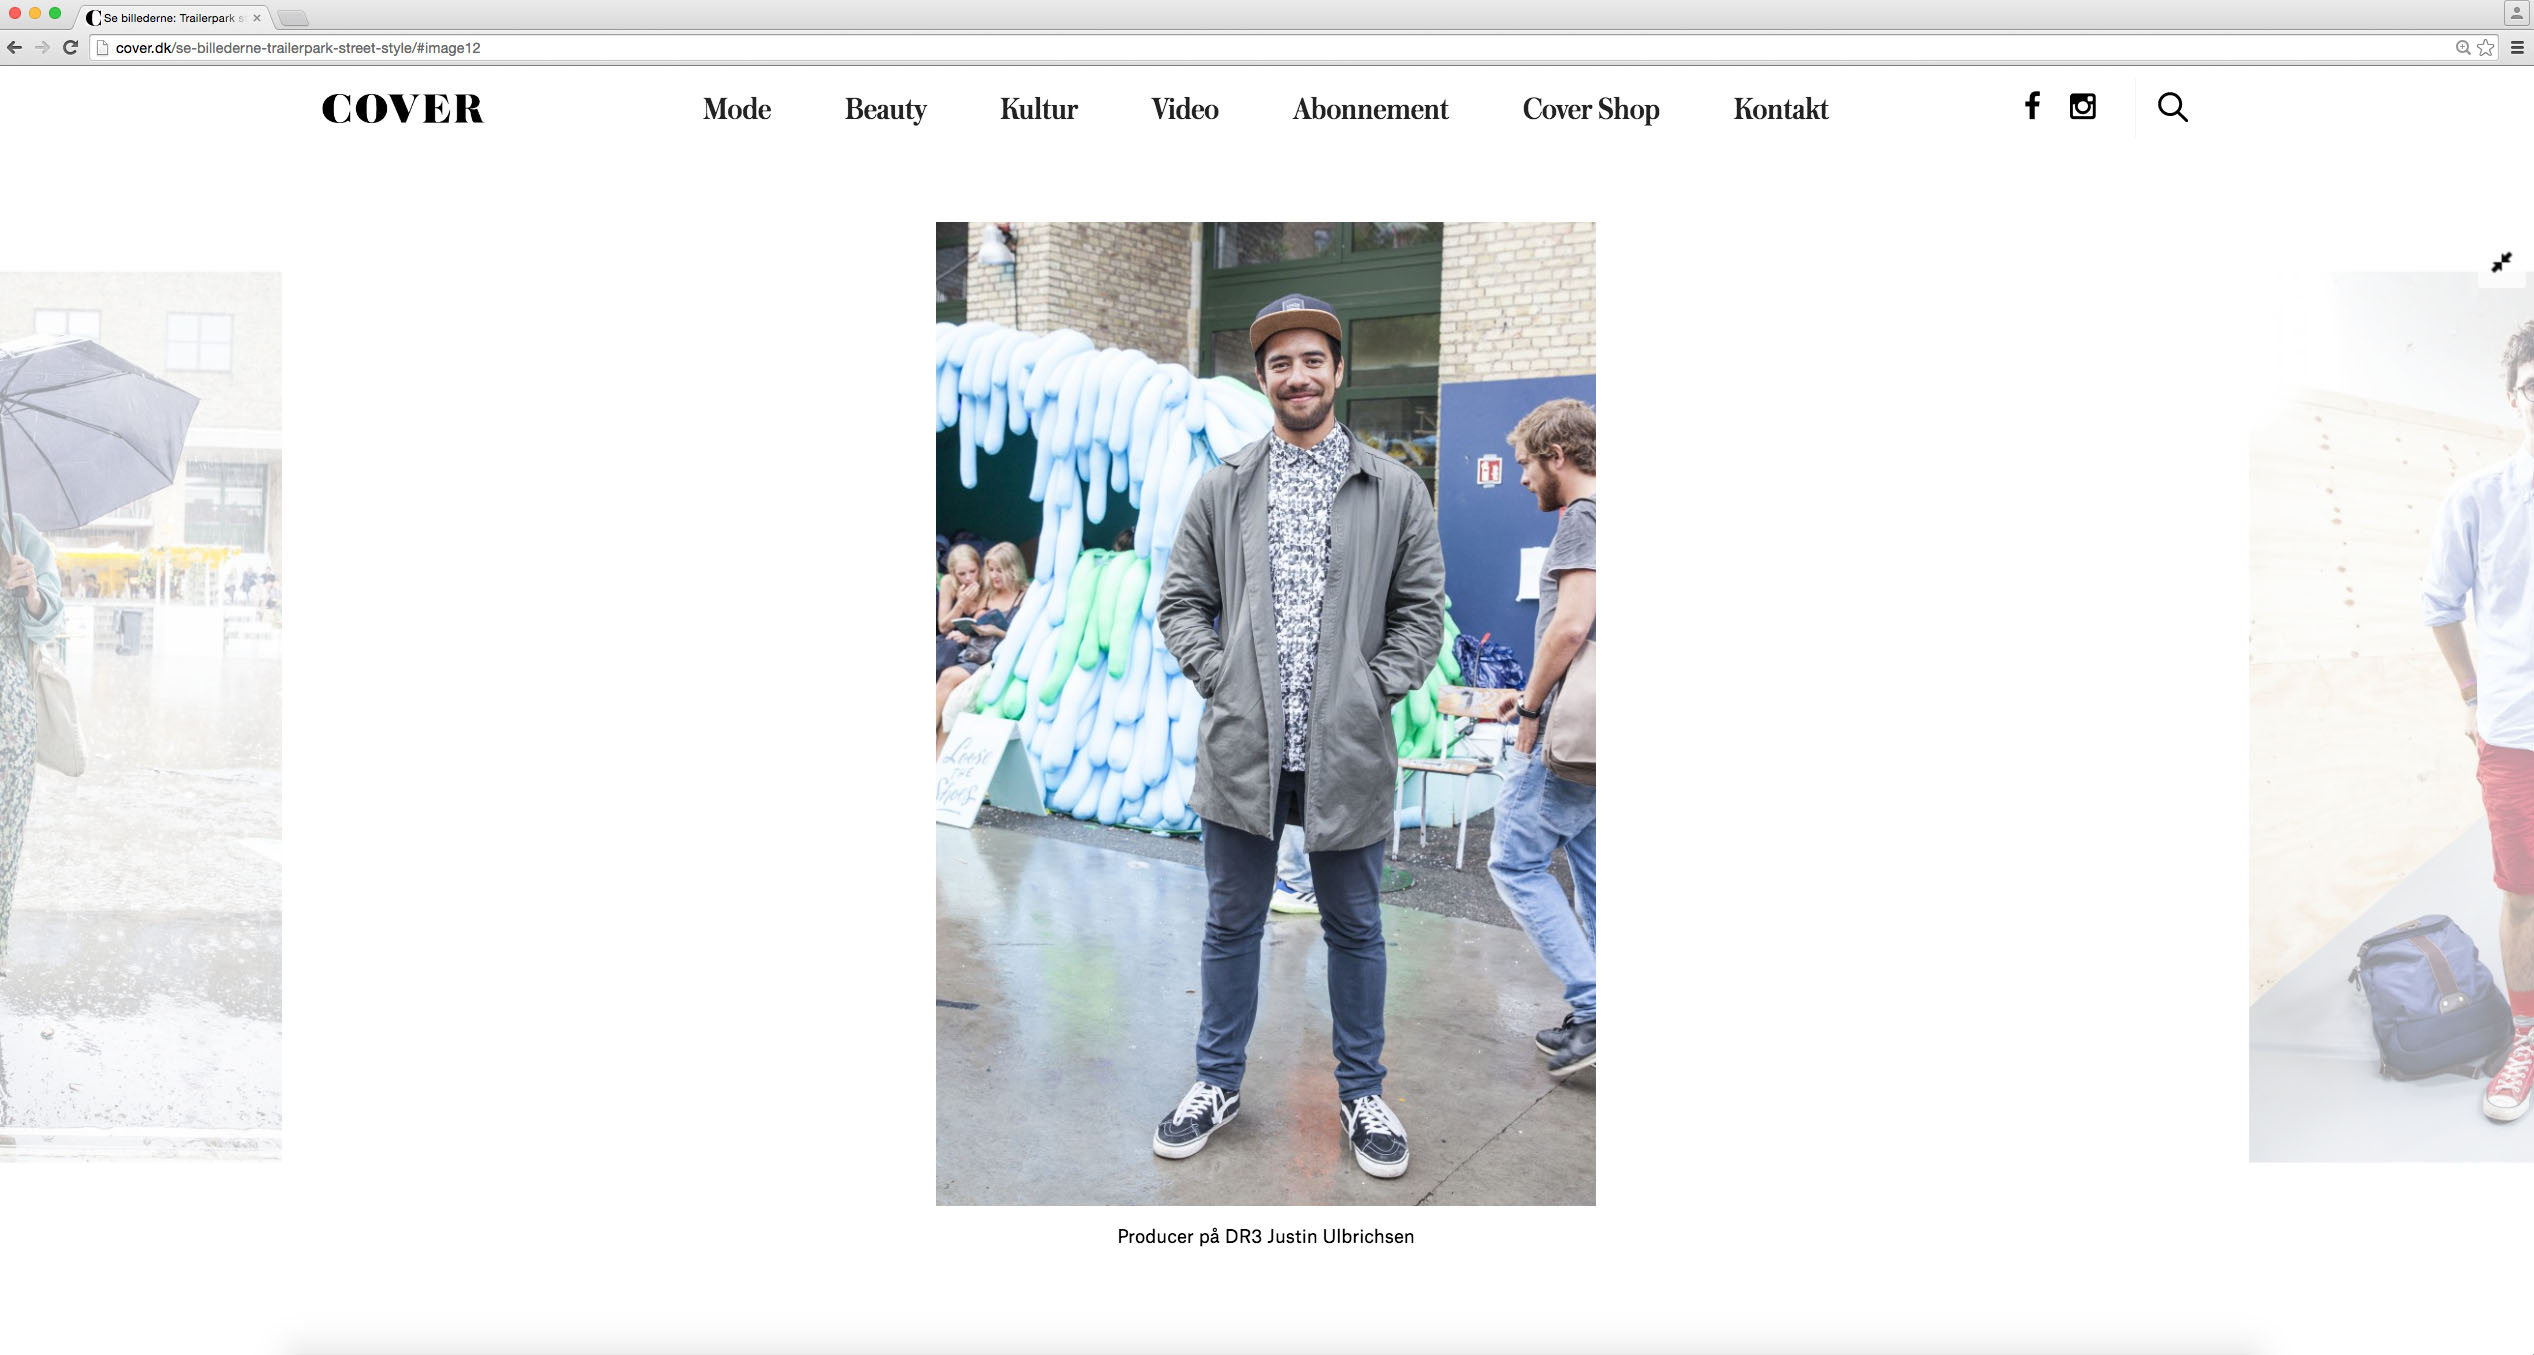 Streetstyle_CoverMagazine_TrailerparkFestival2016_12